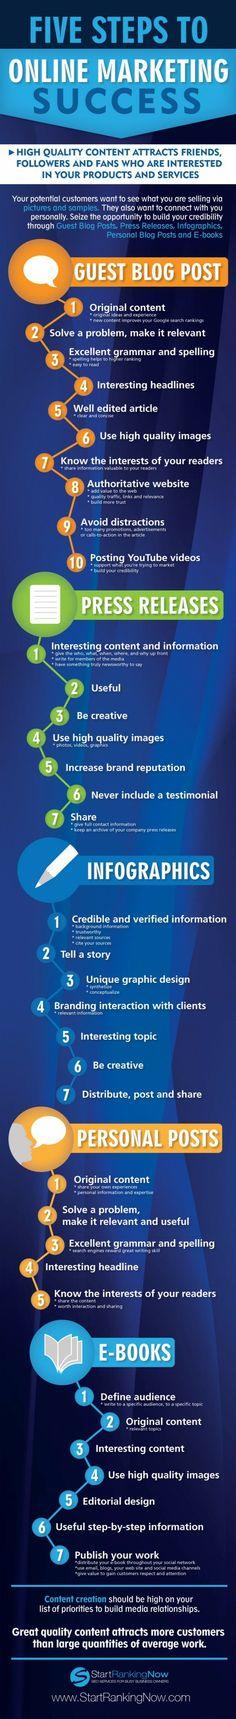 Five Steps To Online Marketing Success #onlinemarketing